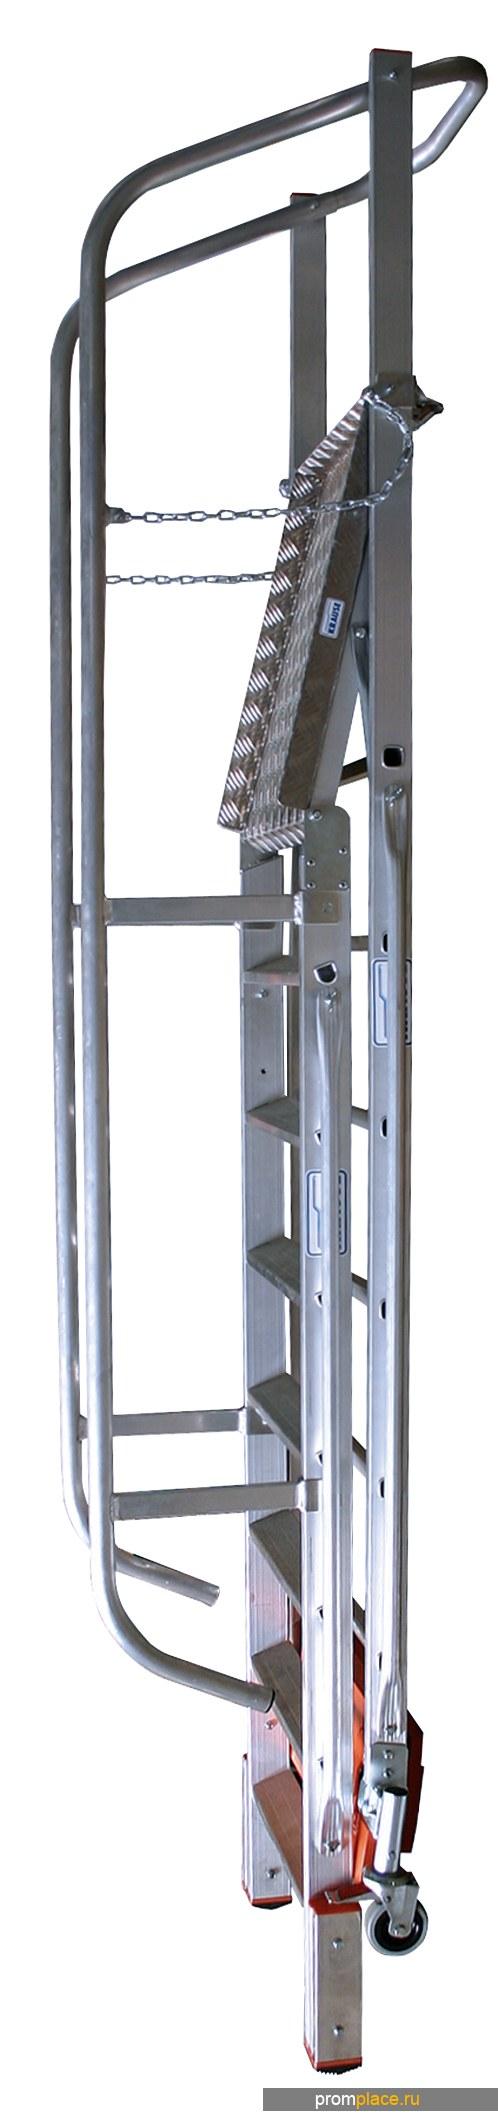 "Лестница с платформой ""Vario компакт"" Складная. Рабочая высота: 3,10 m – 5,28 m"